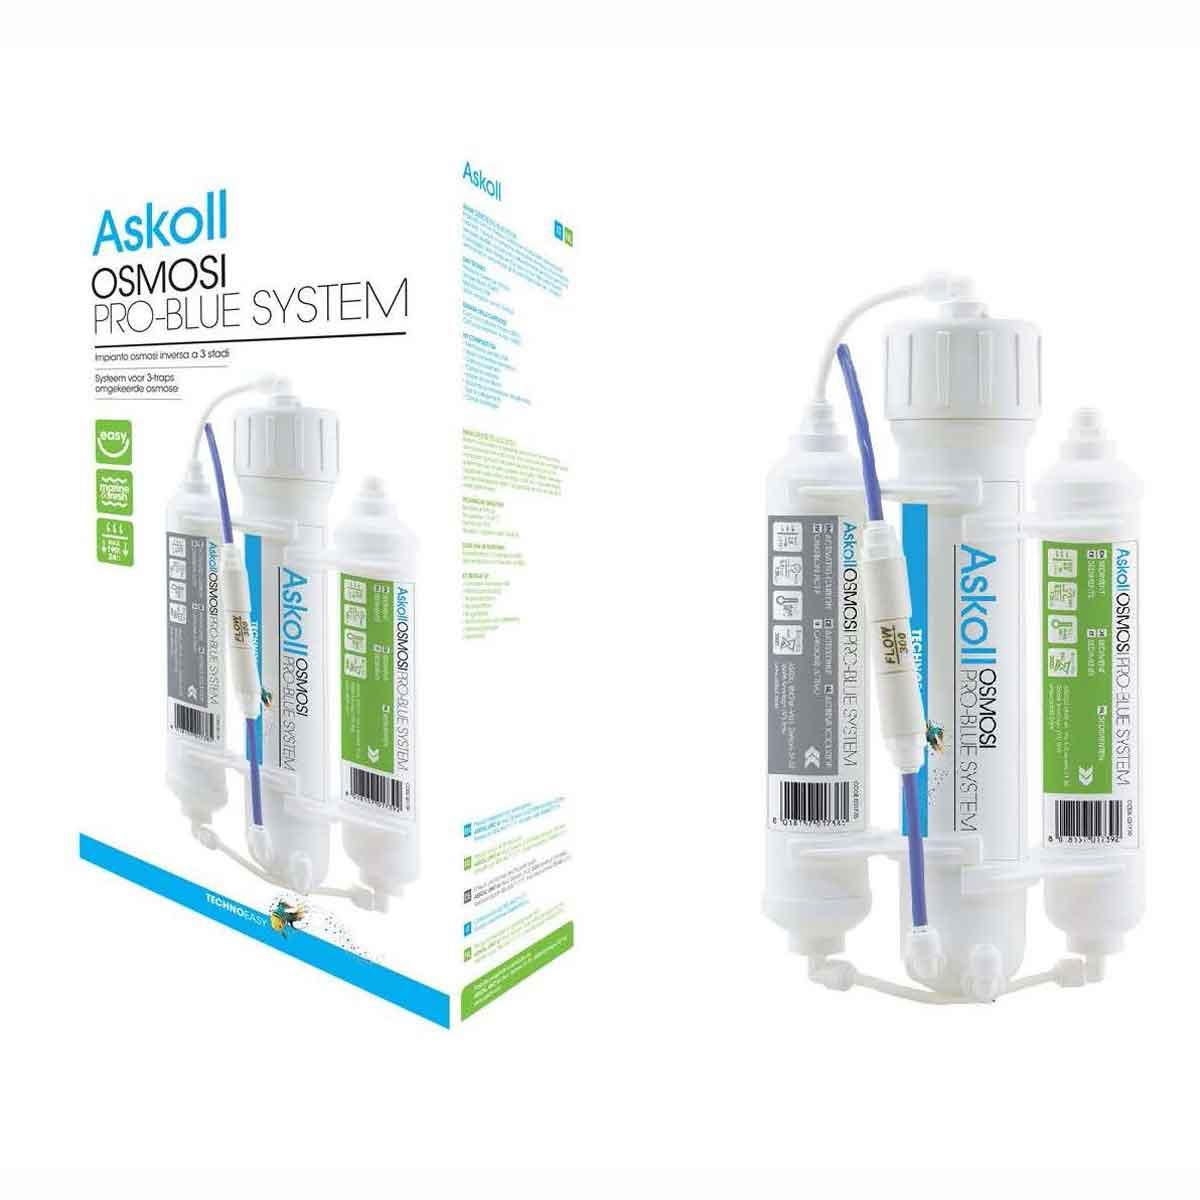 Askoll Osmosi Pro-Blue System 3 Stadi